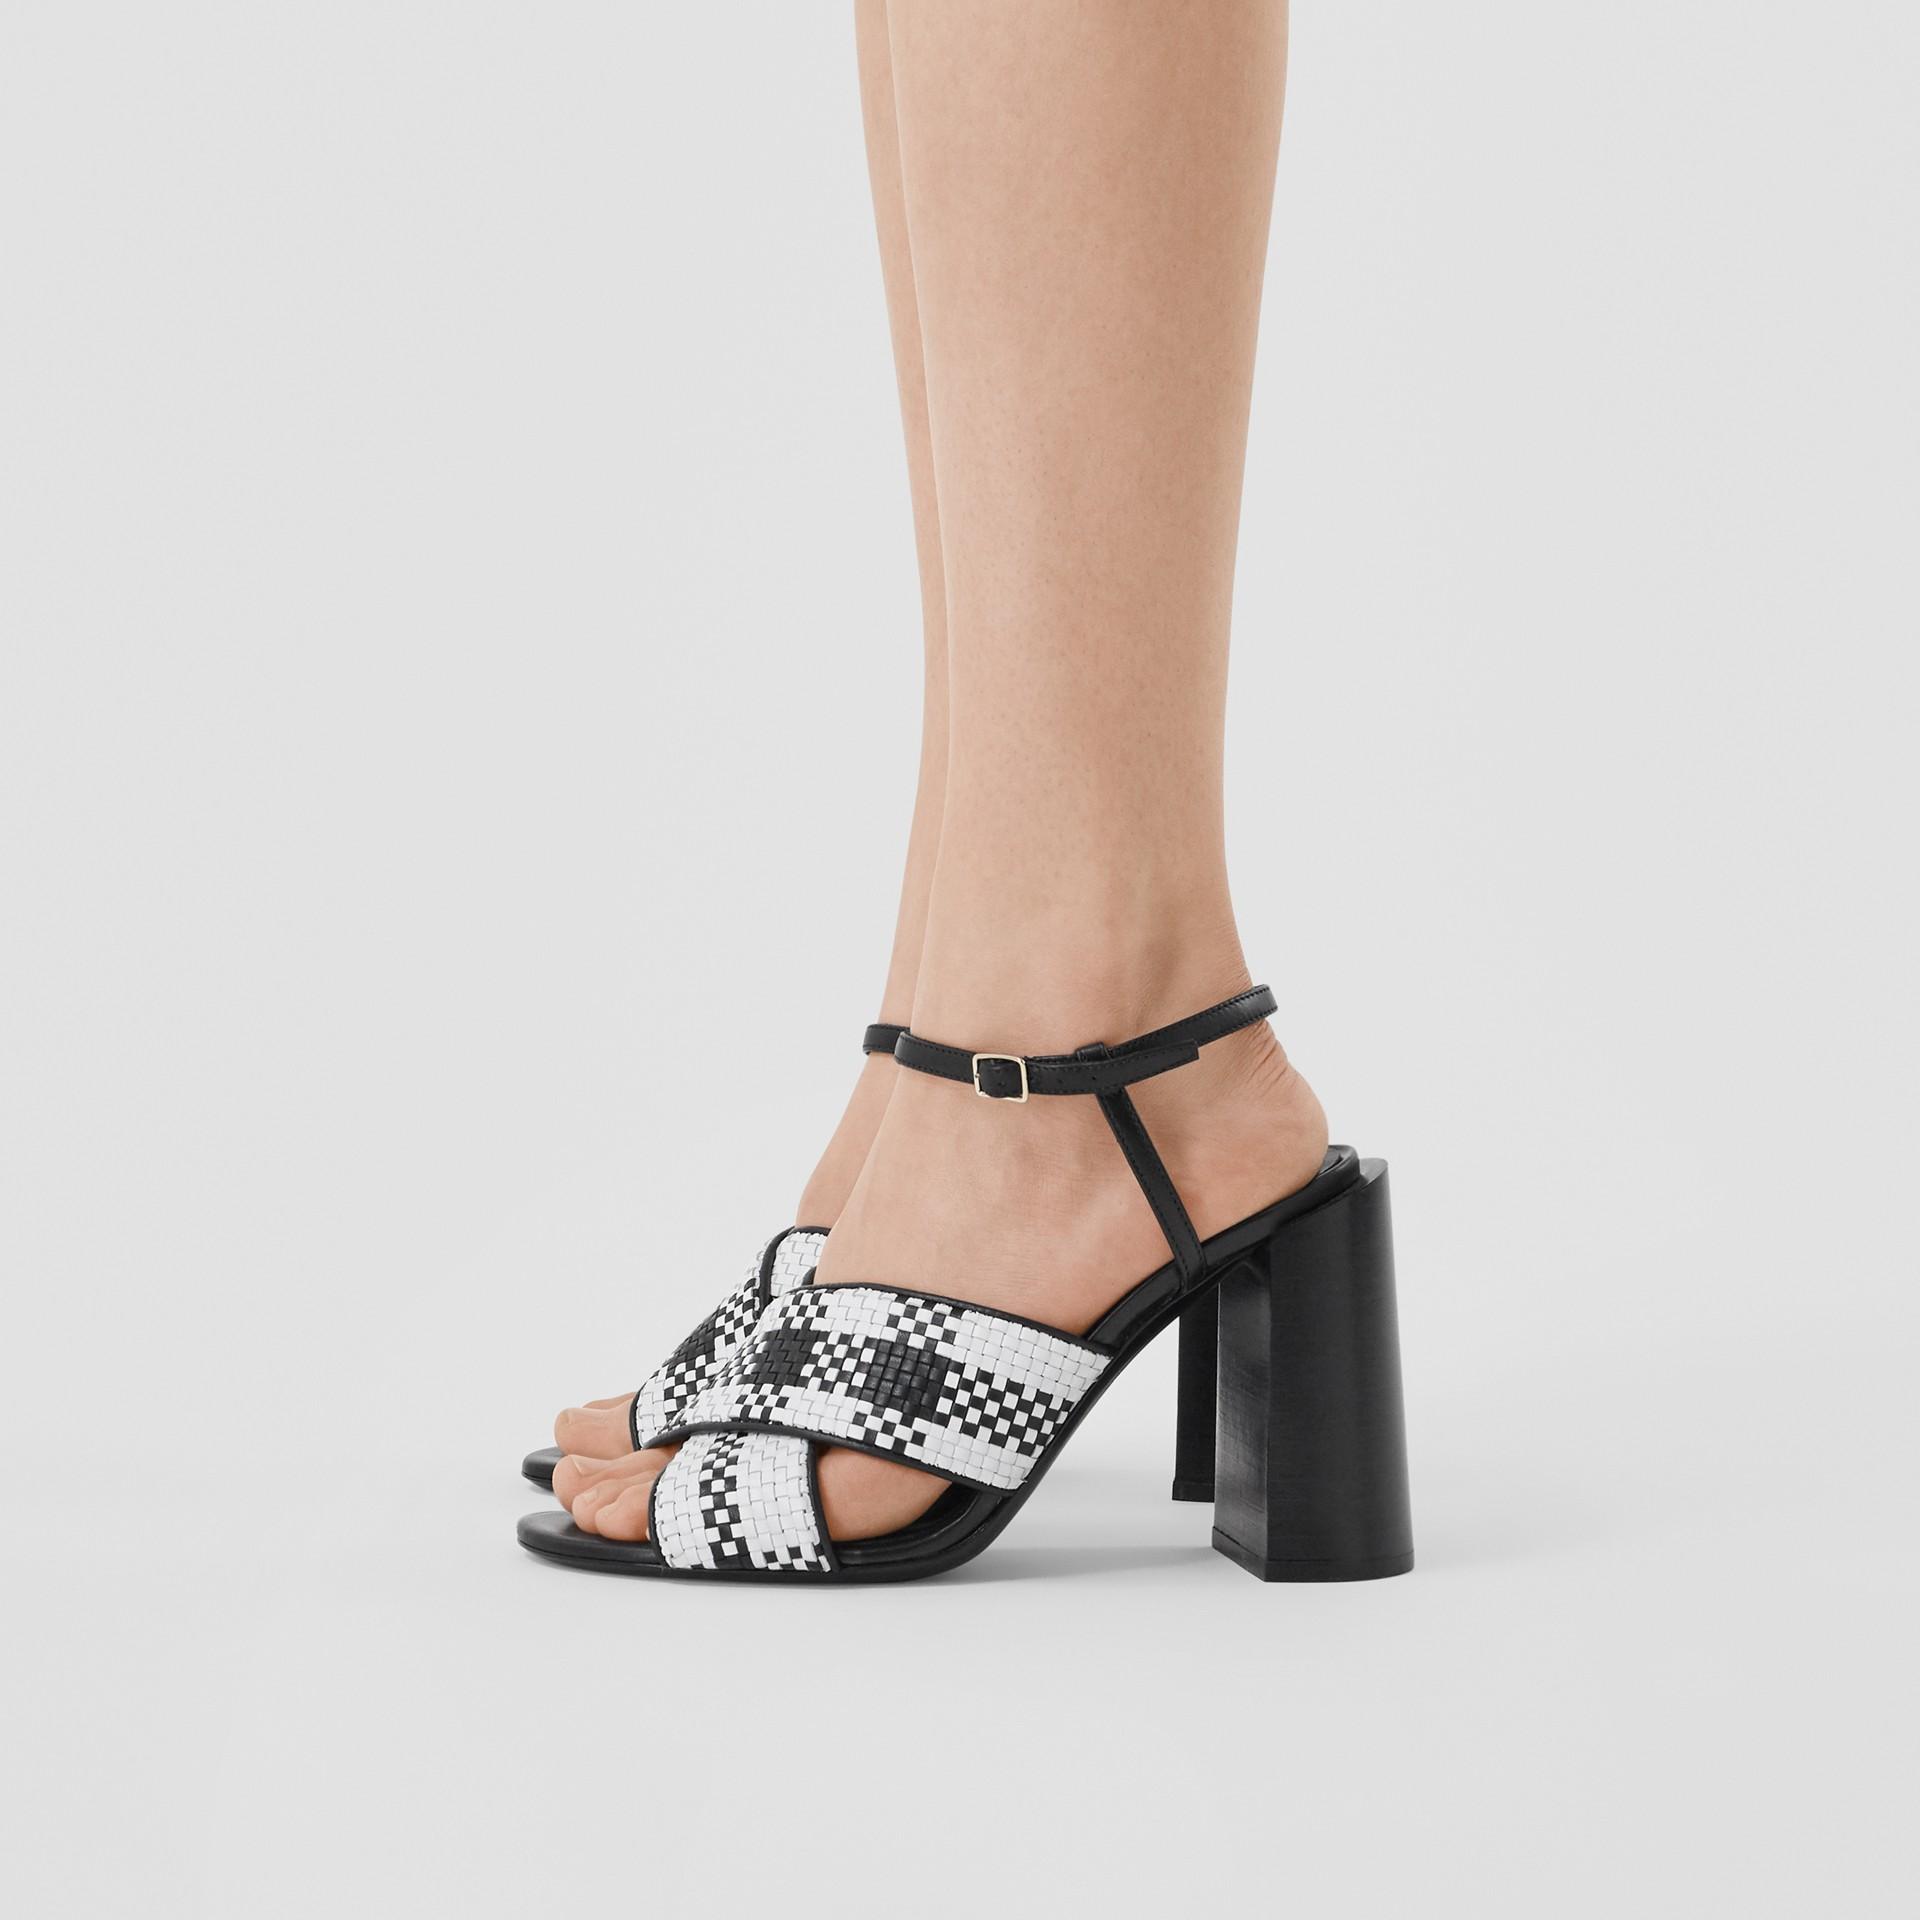 Latticed Leather Block-heel Sandals in Black/white - Women | Burberry - gallery image 2